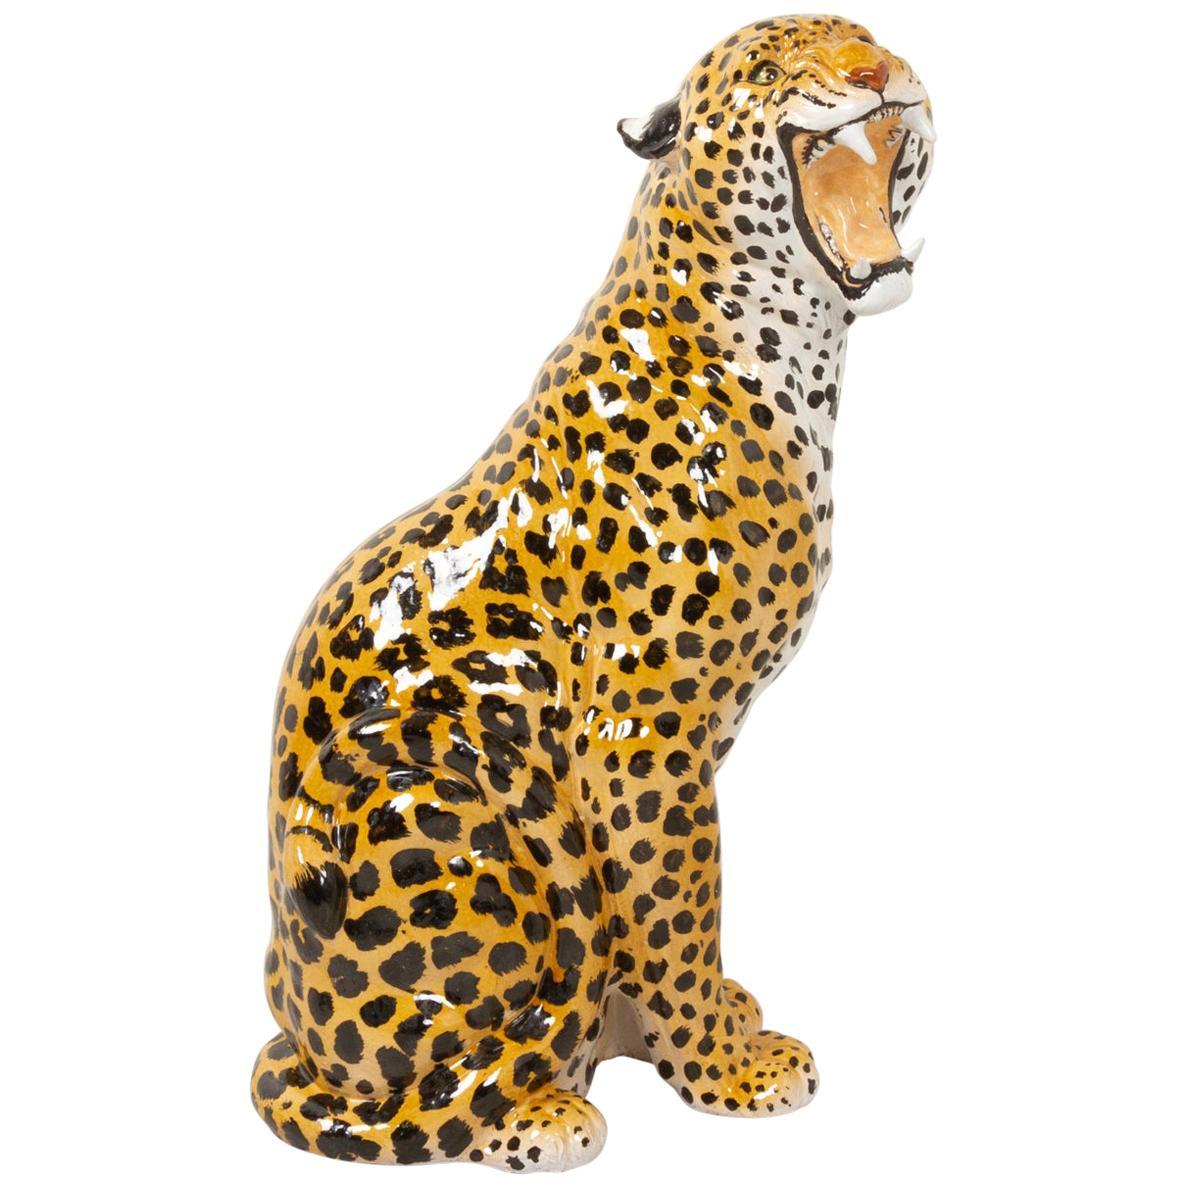 Vintage Italian Life-Size Terracotta Leopard, 1960s